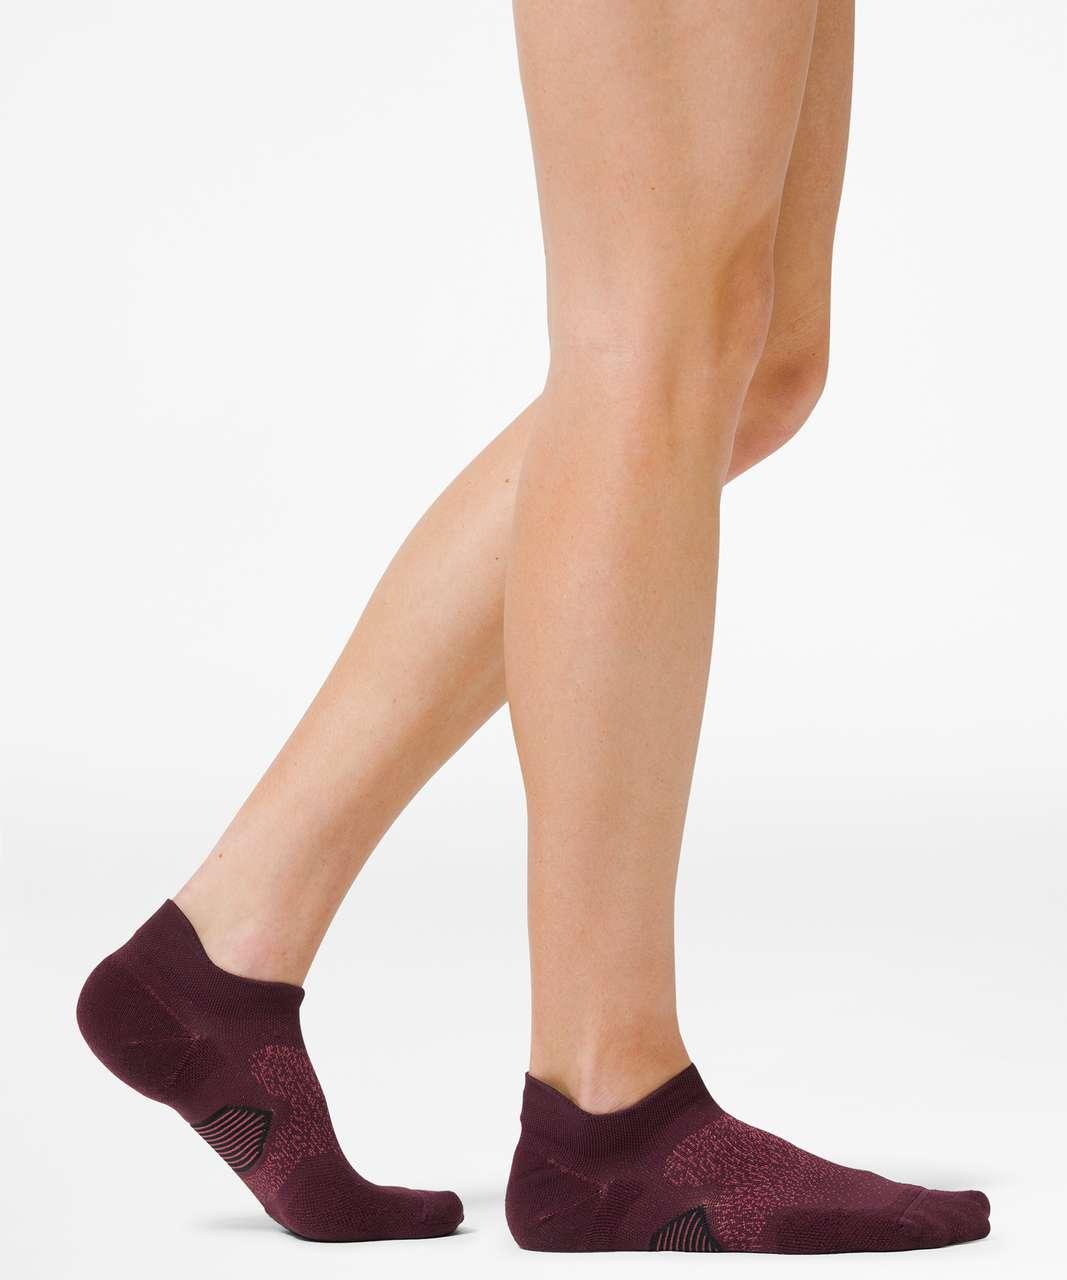 Lululemon Speed Sock *Silver - Cassis / Chianti